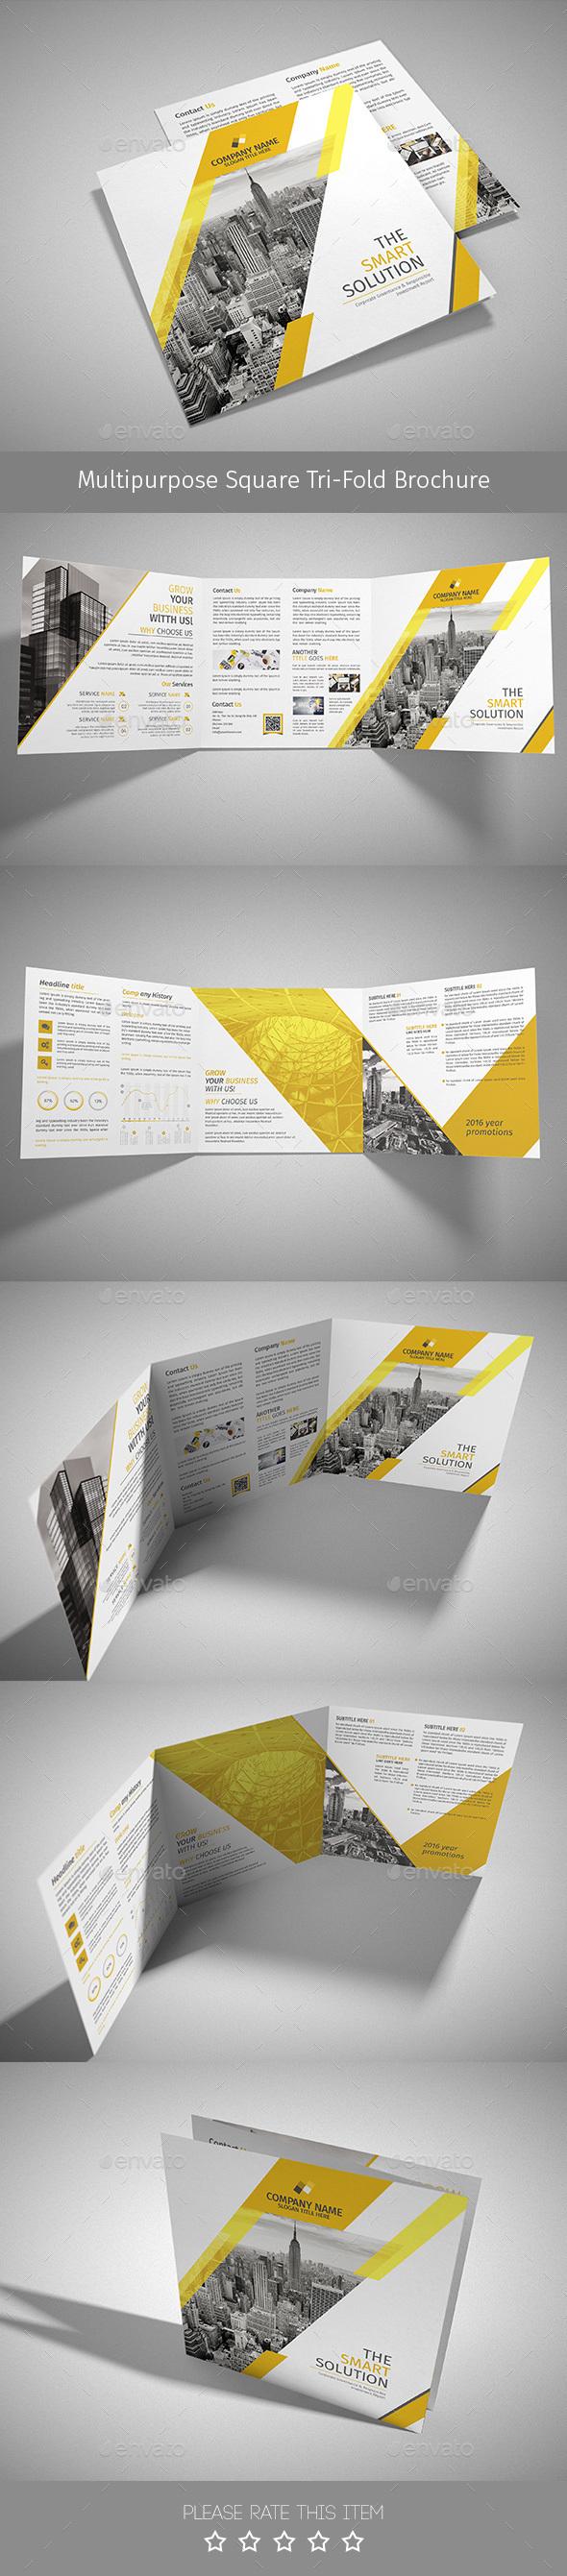 Corporate Tri-fold Square Brochure 08 - Corporate Brochures